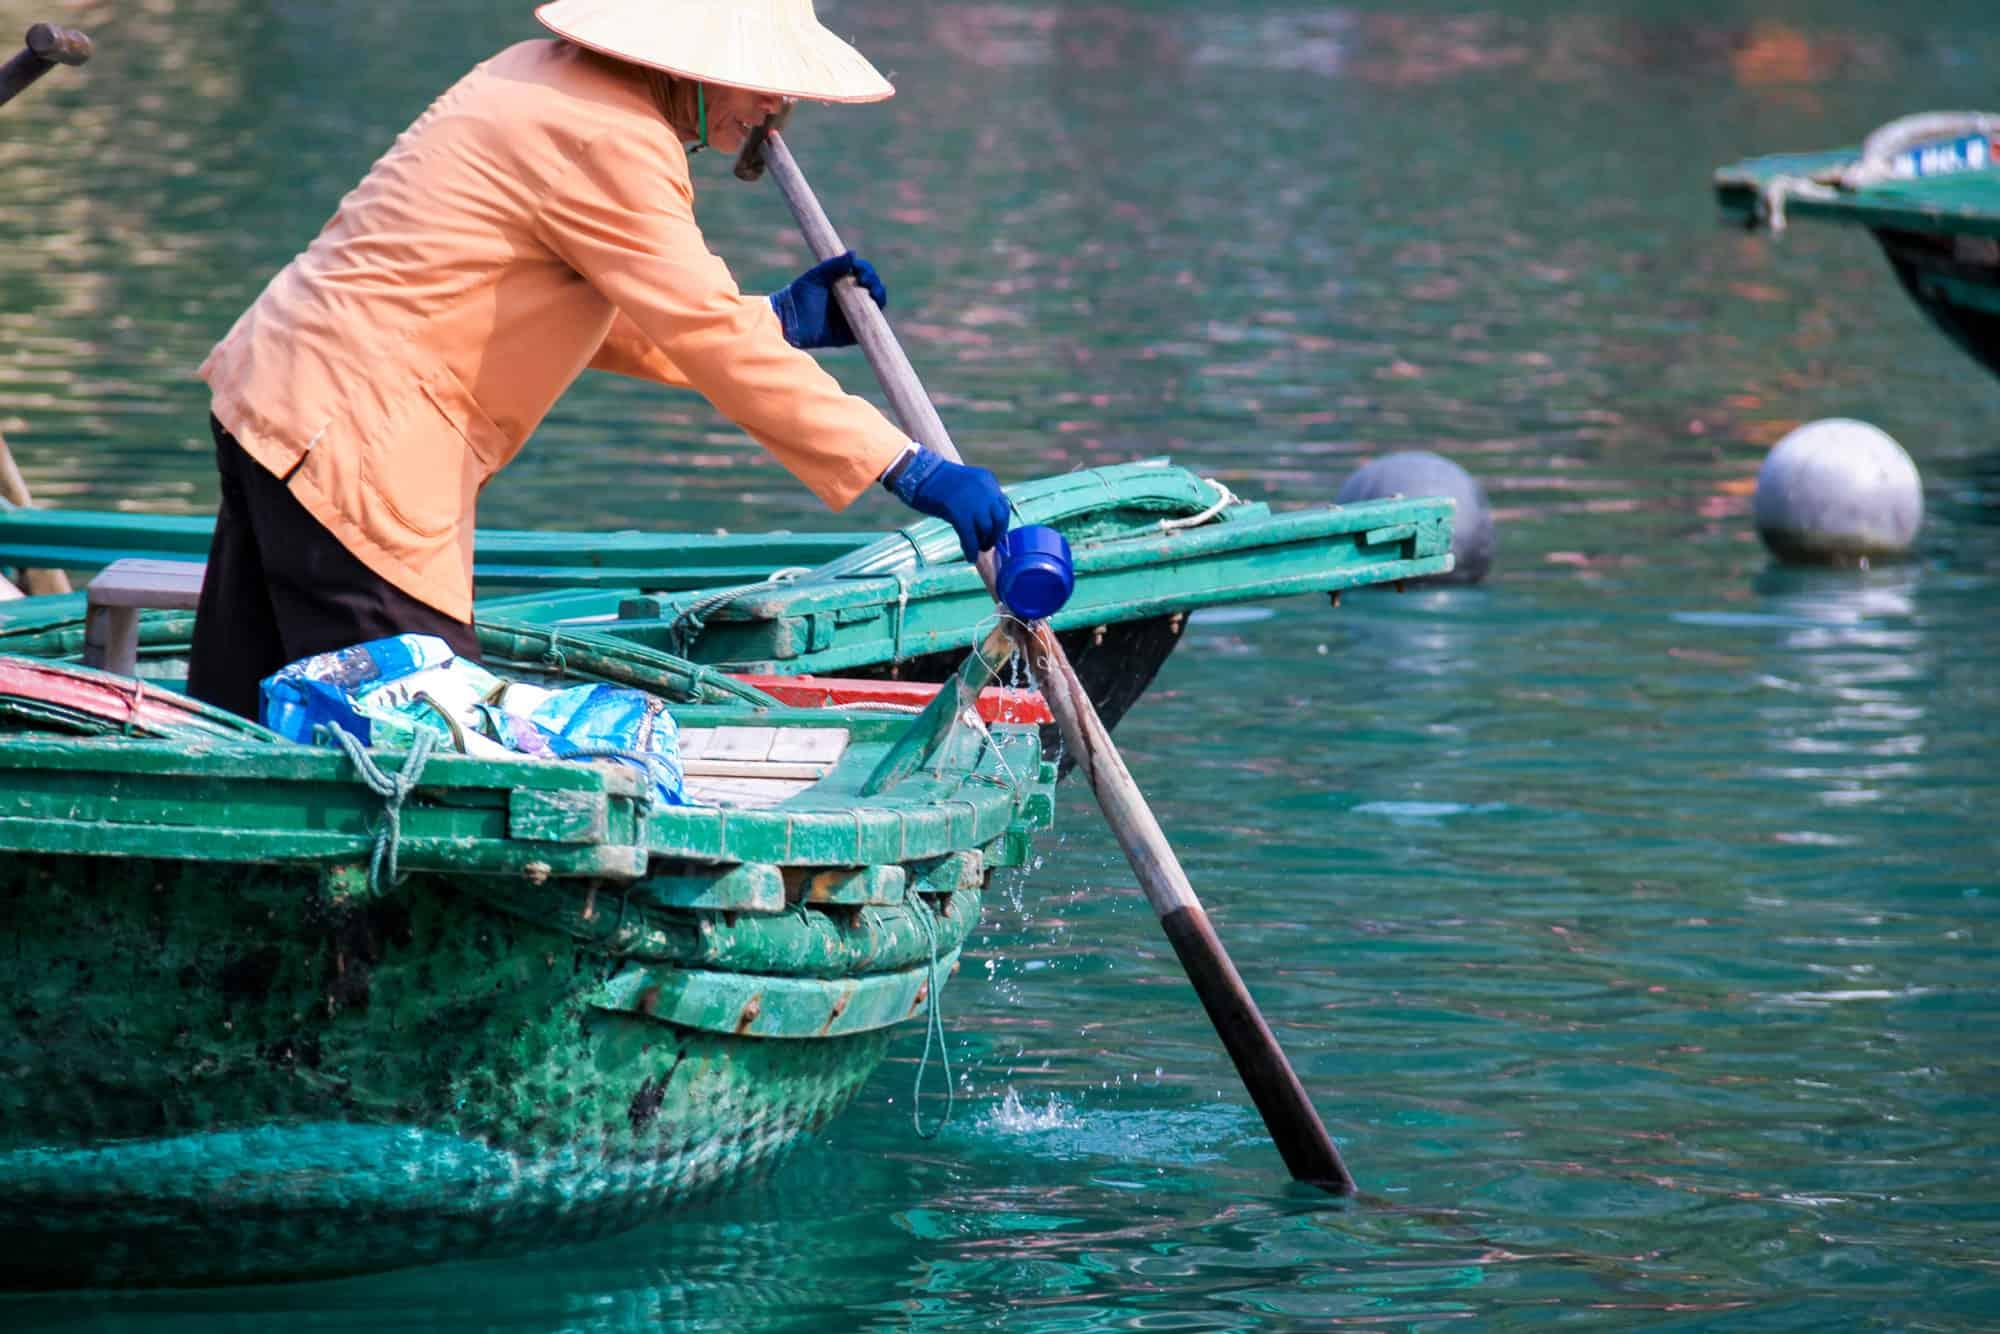 Vietnam - Halong Bay - Vung Vieng Floating Fishing Village Woman Rowing boat to gather tourists